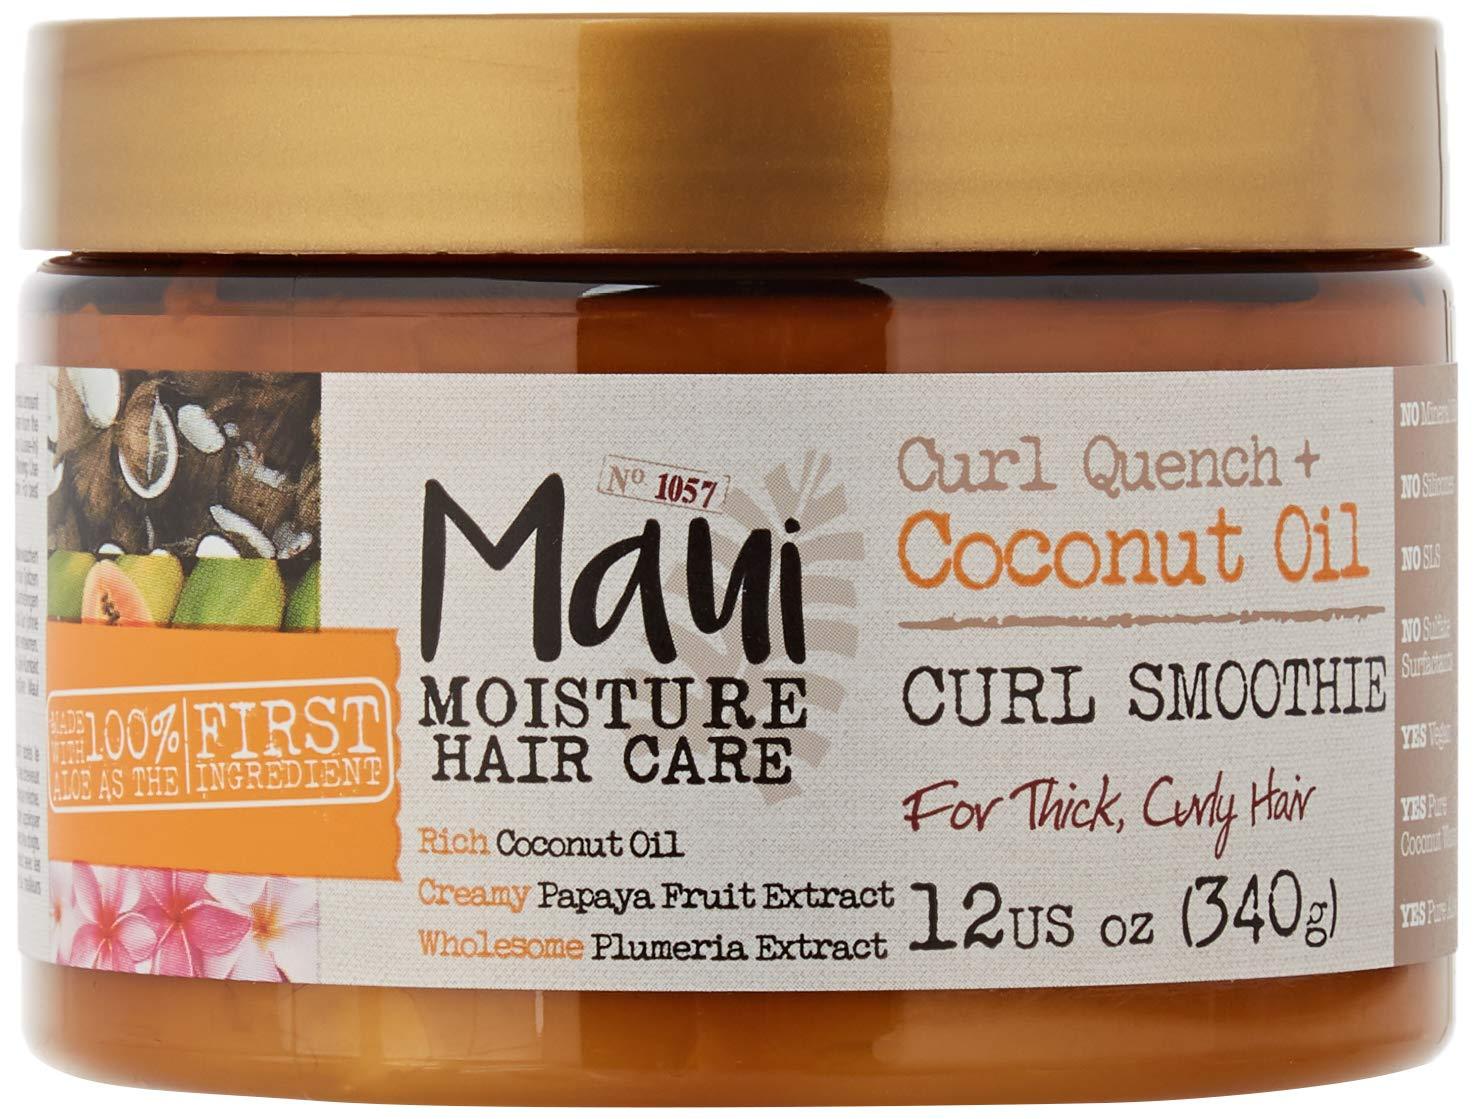 Maui Moisture Vegan Coconut Oil Aloe Vera Hair Mask Smoothie for Curly Frizzy Hair 340 g